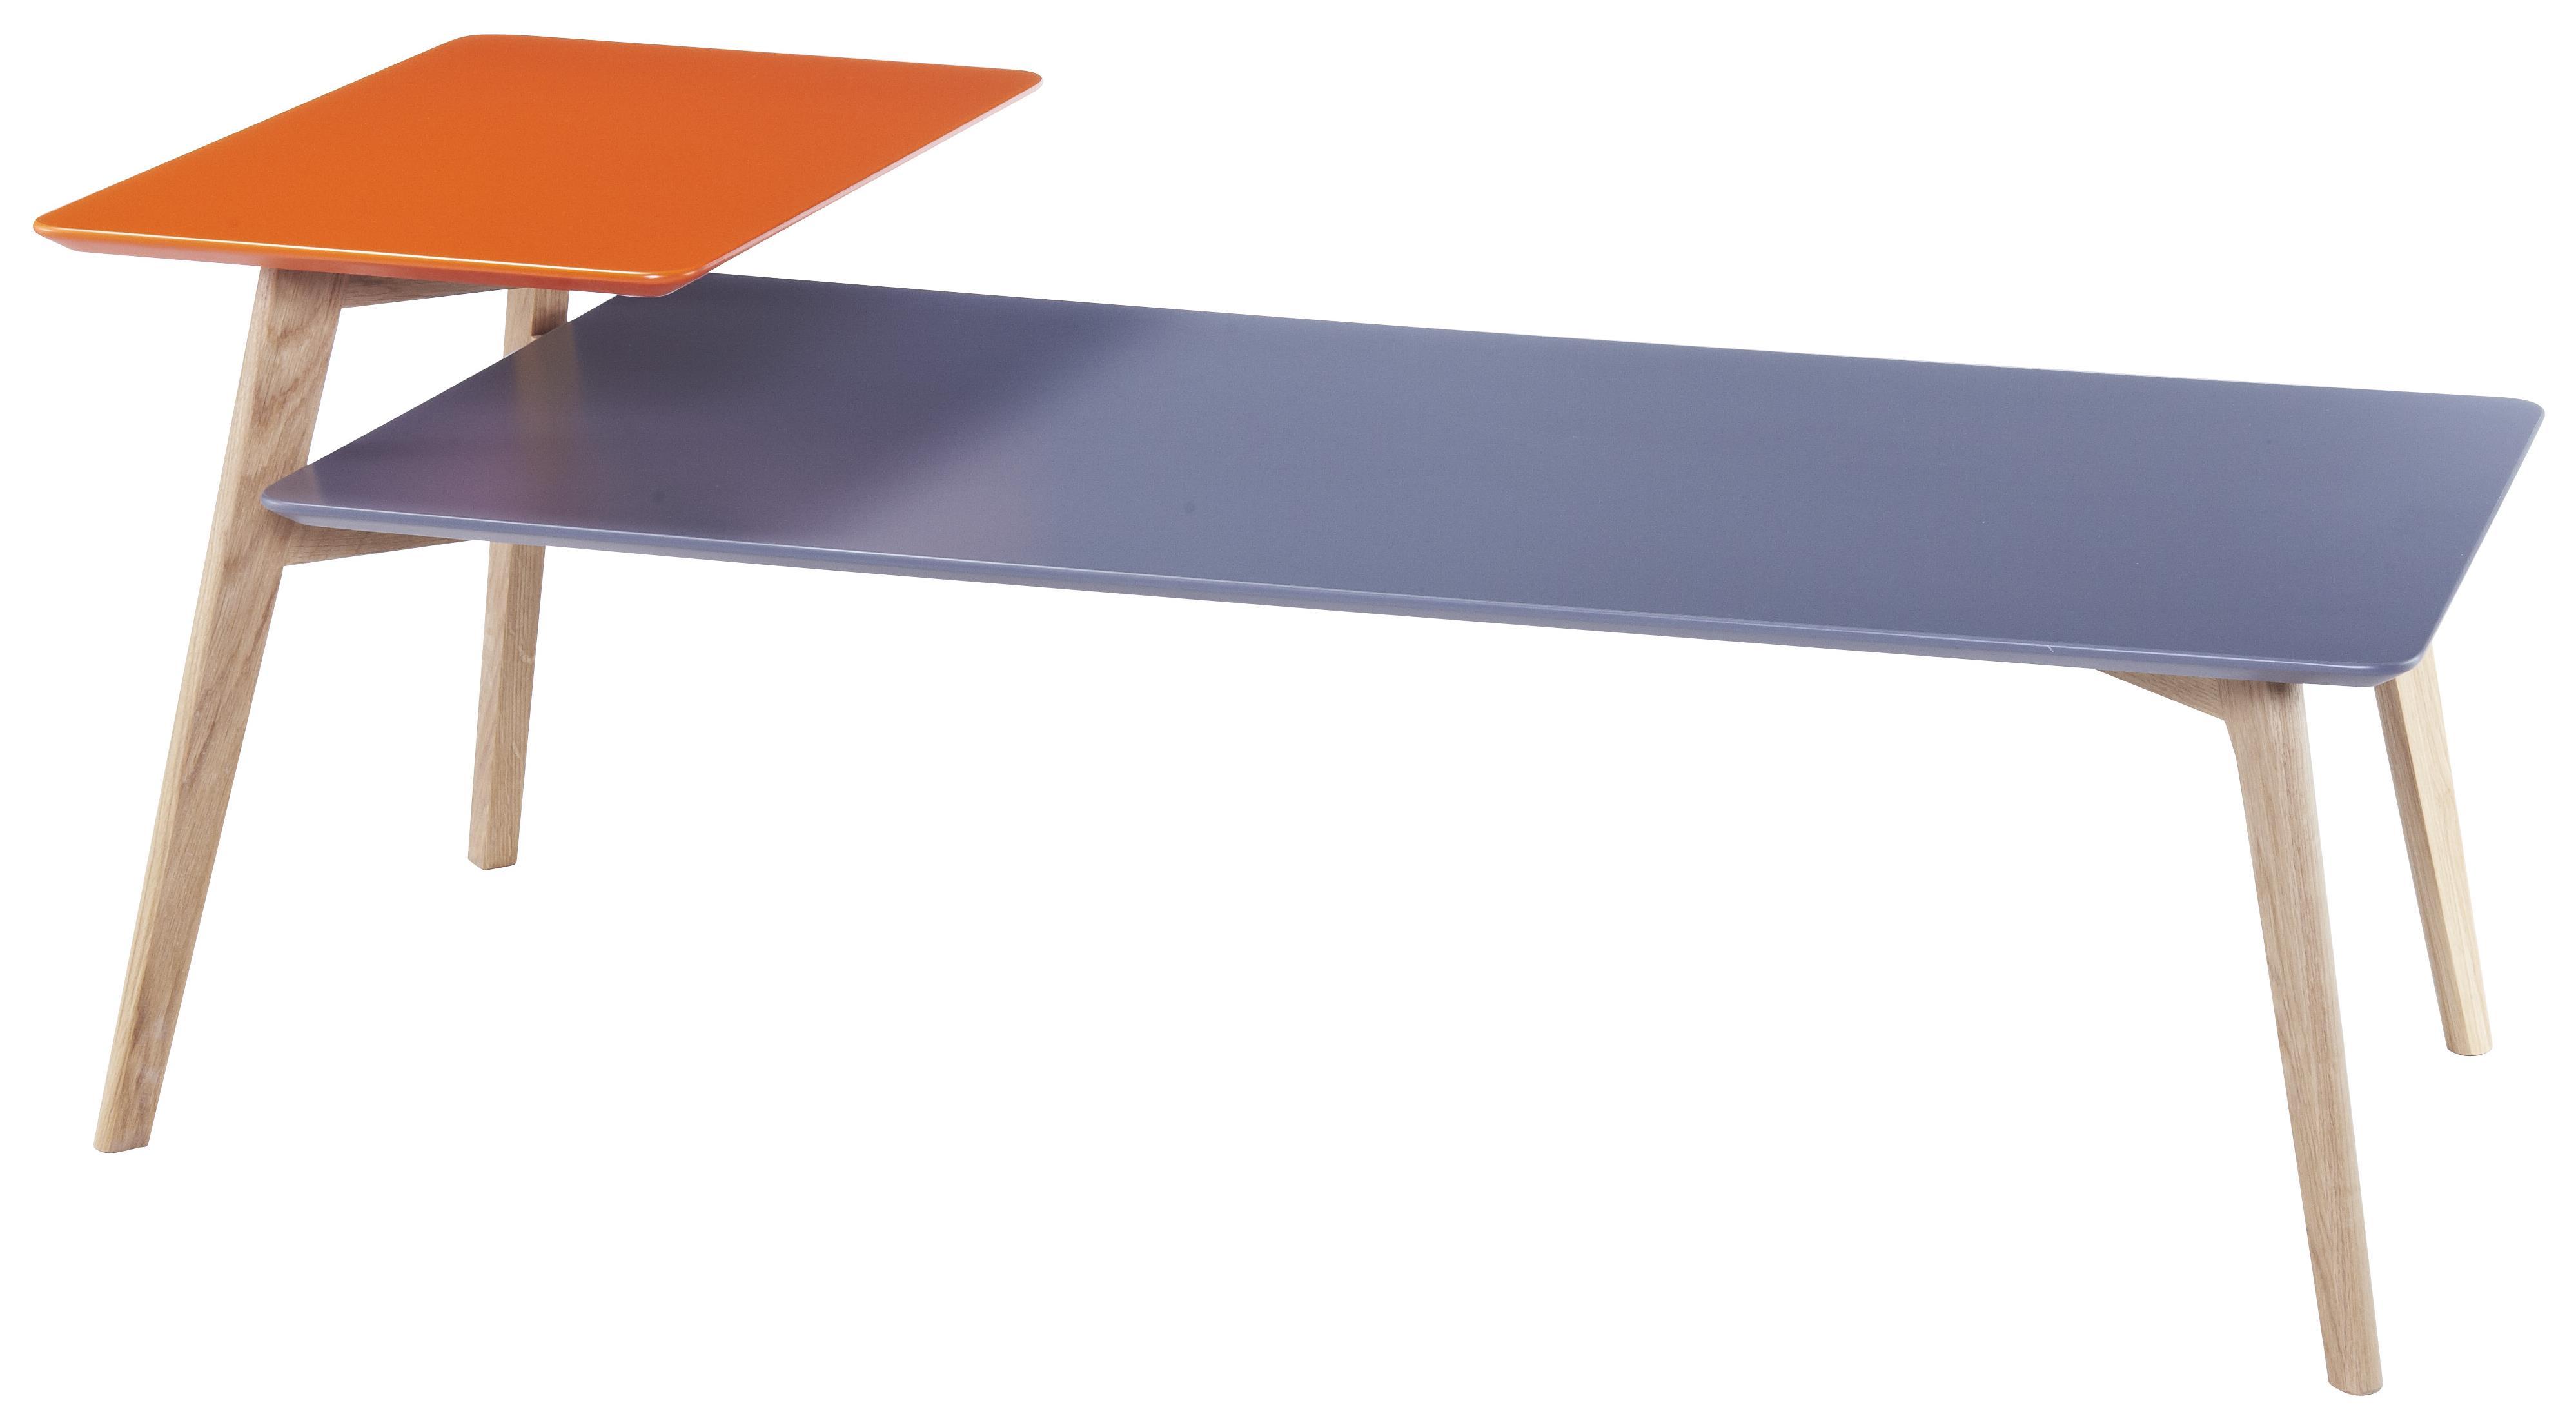 Diamond Sofa Tangent Rectangular Cocktail Table w/ Oak Legs - Item Number: TANGENTCTGR